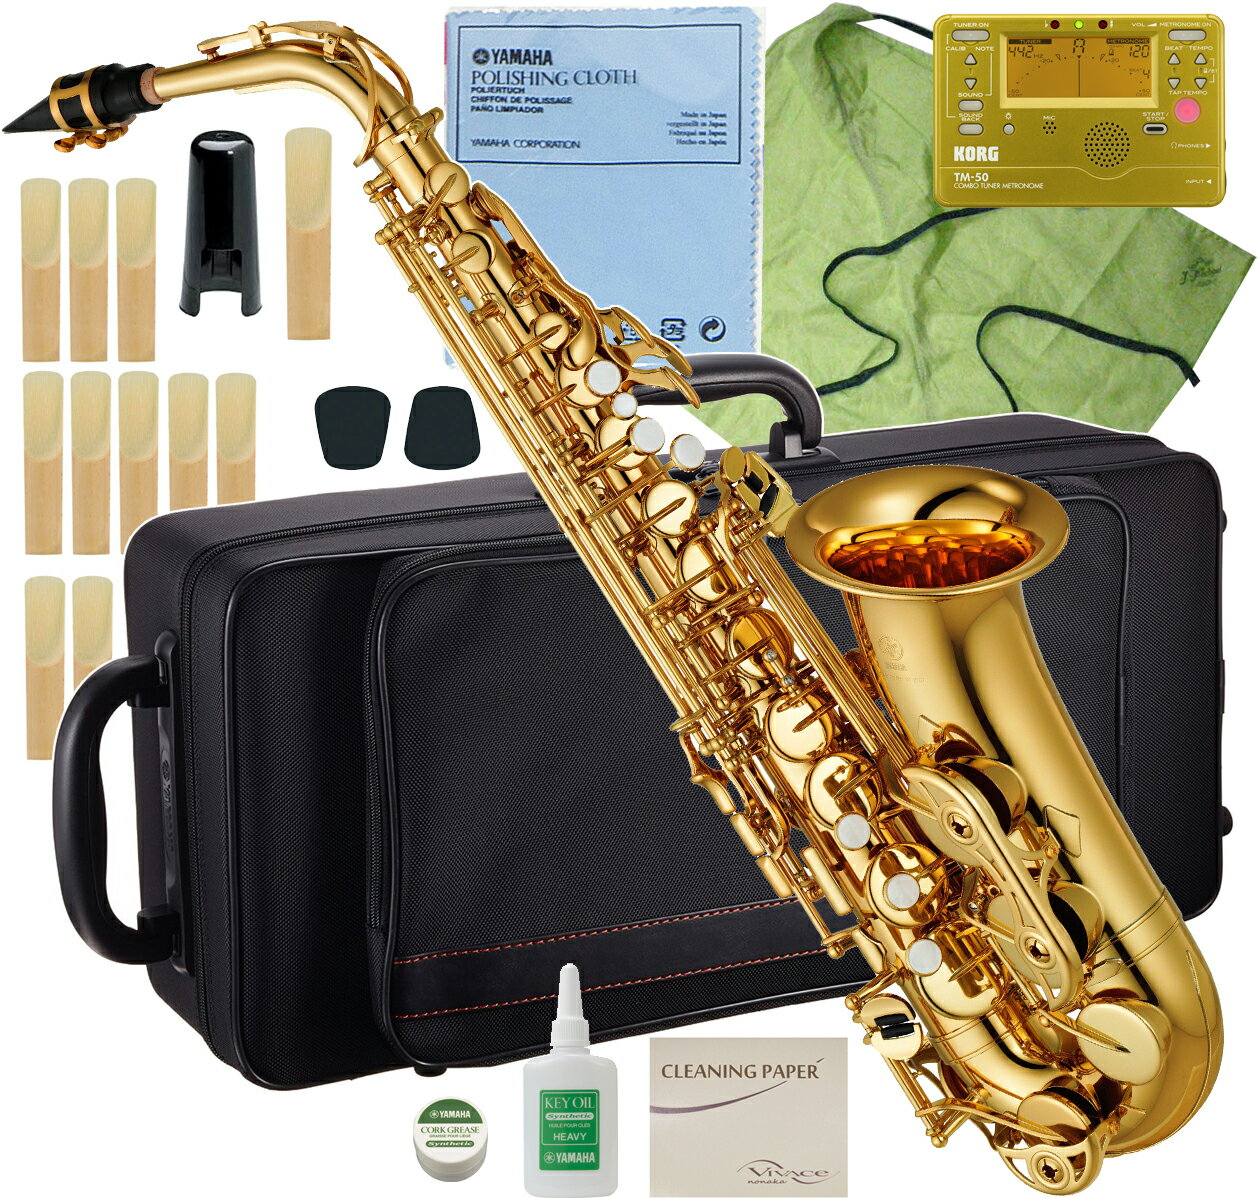 YAMAHA(ヤマハ)YAS-380アルトサックス新品管楽器サックス管体ゴールド初心者管楽器アルトサ